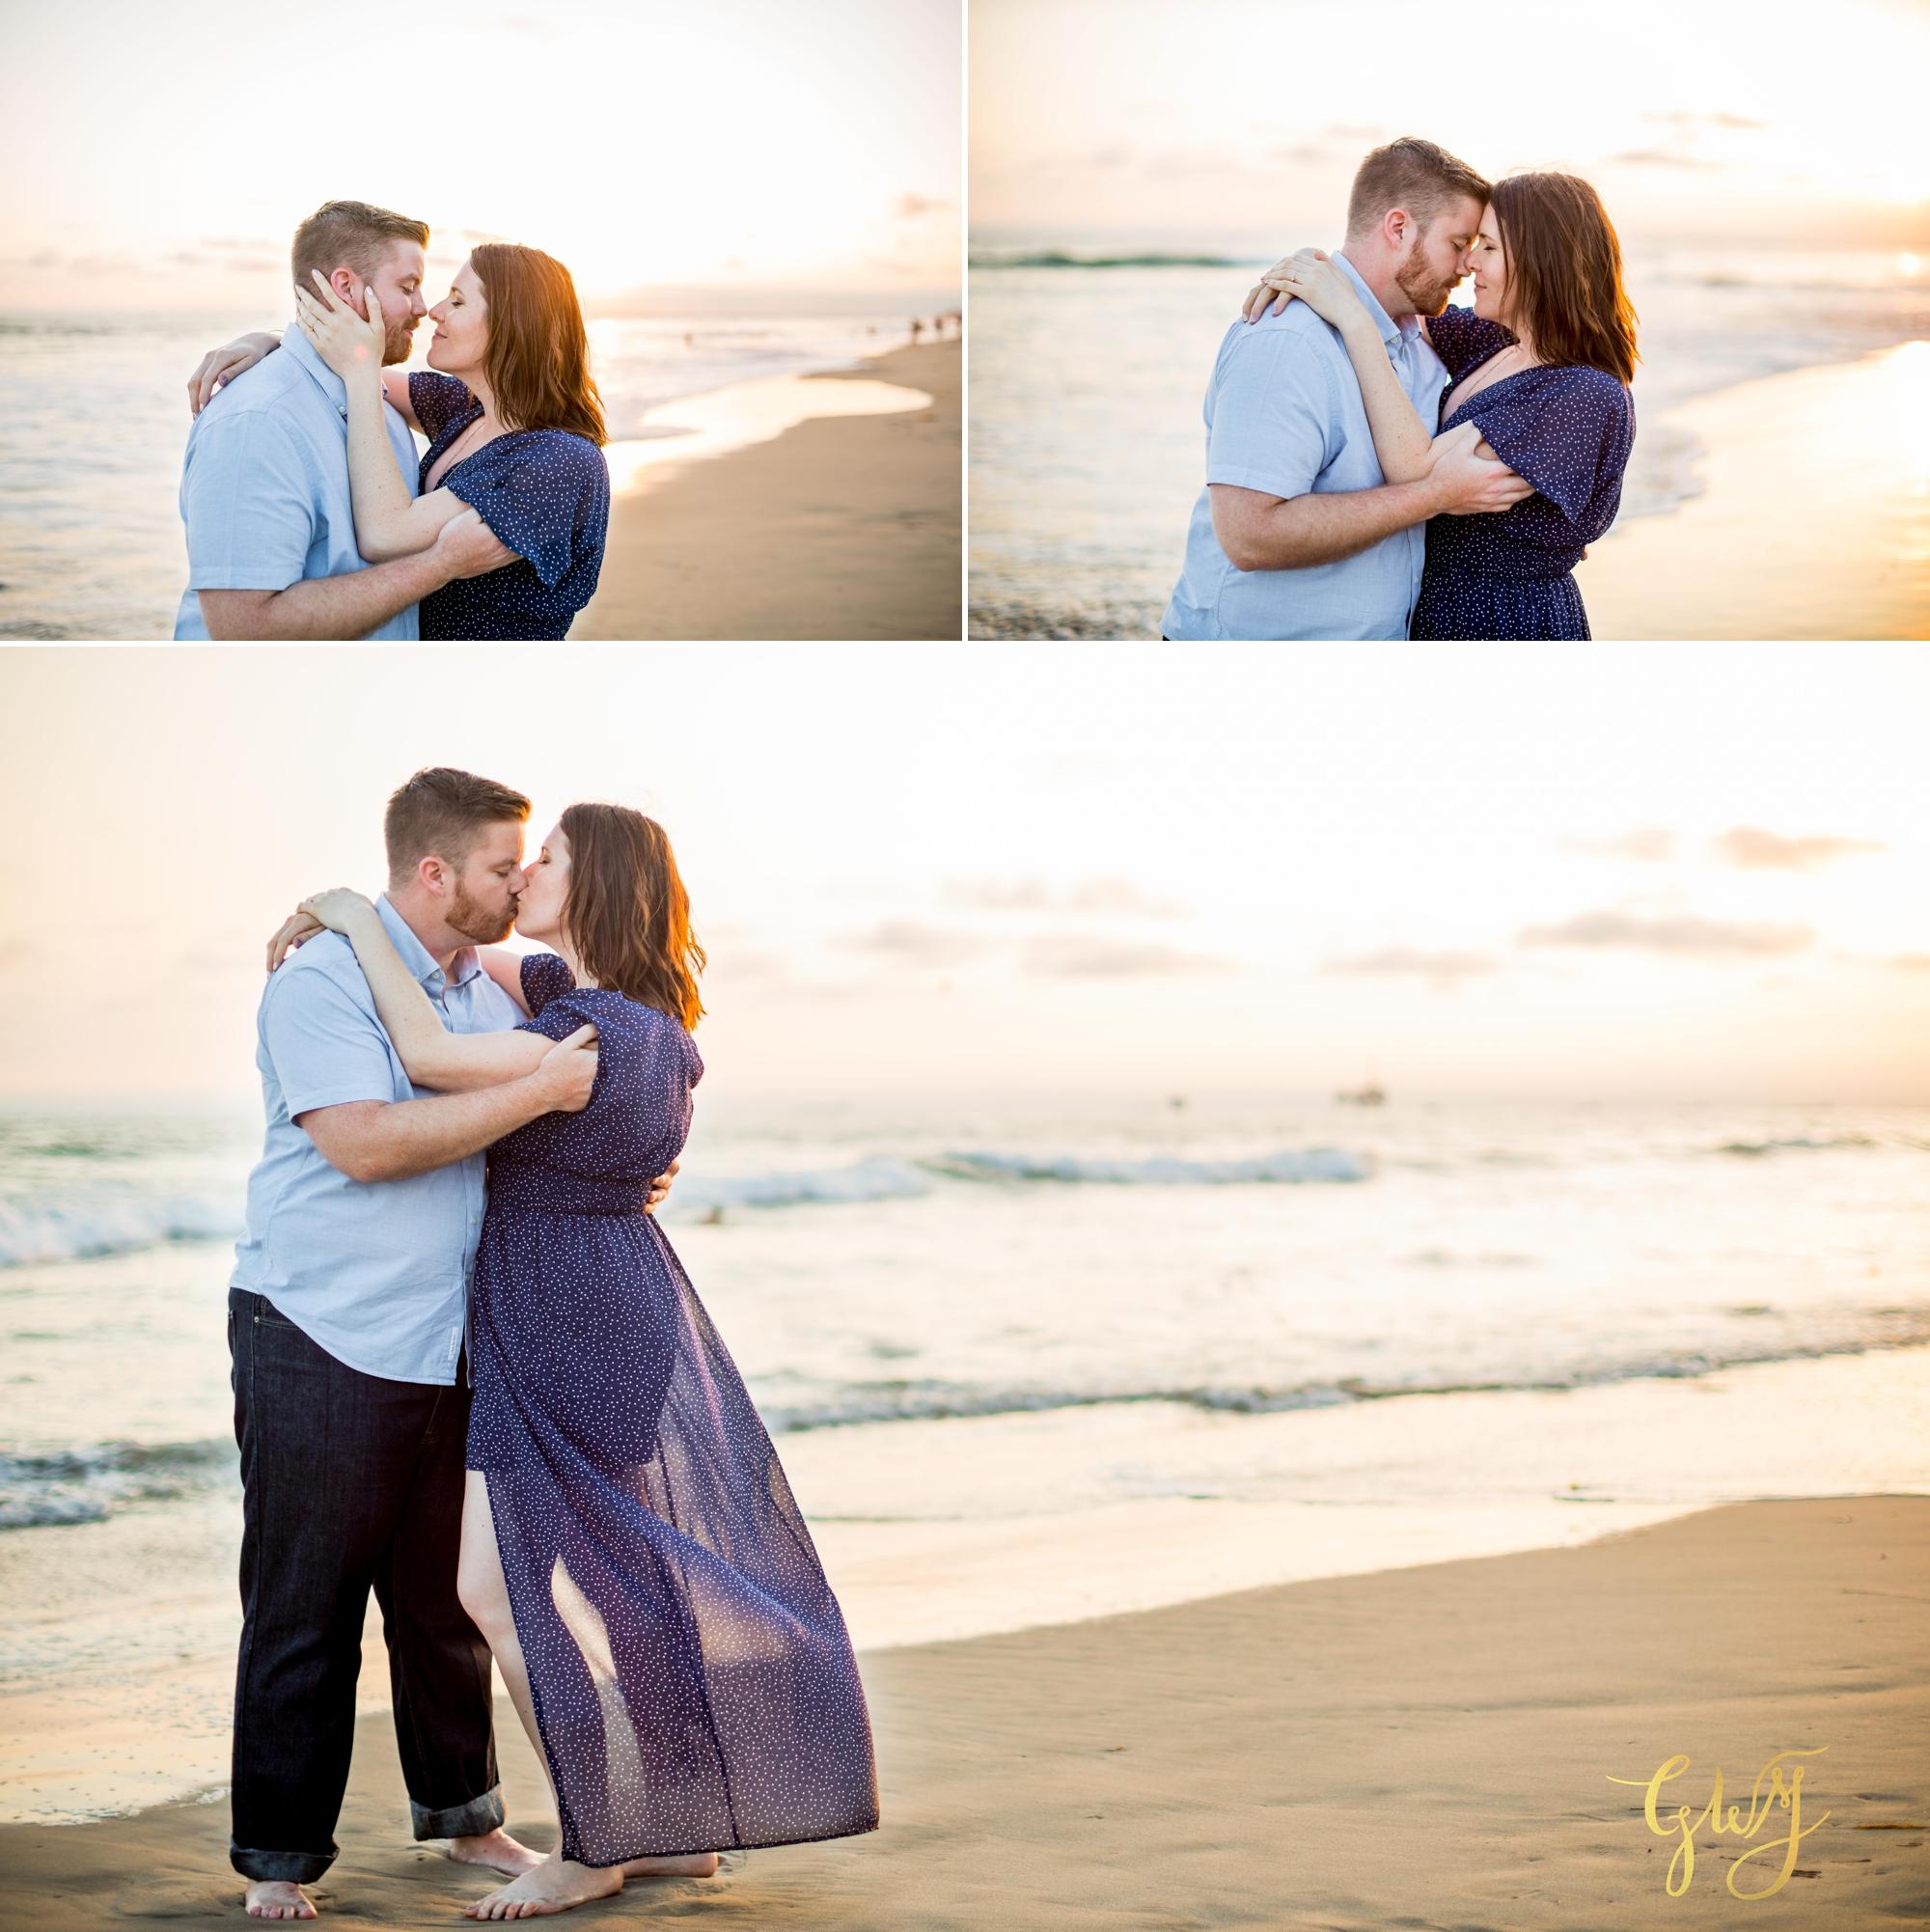 Cristina + David's Huntington Beach Central Park Romantic Sunset Engagement Session by Glass Woods Media 14.jpg